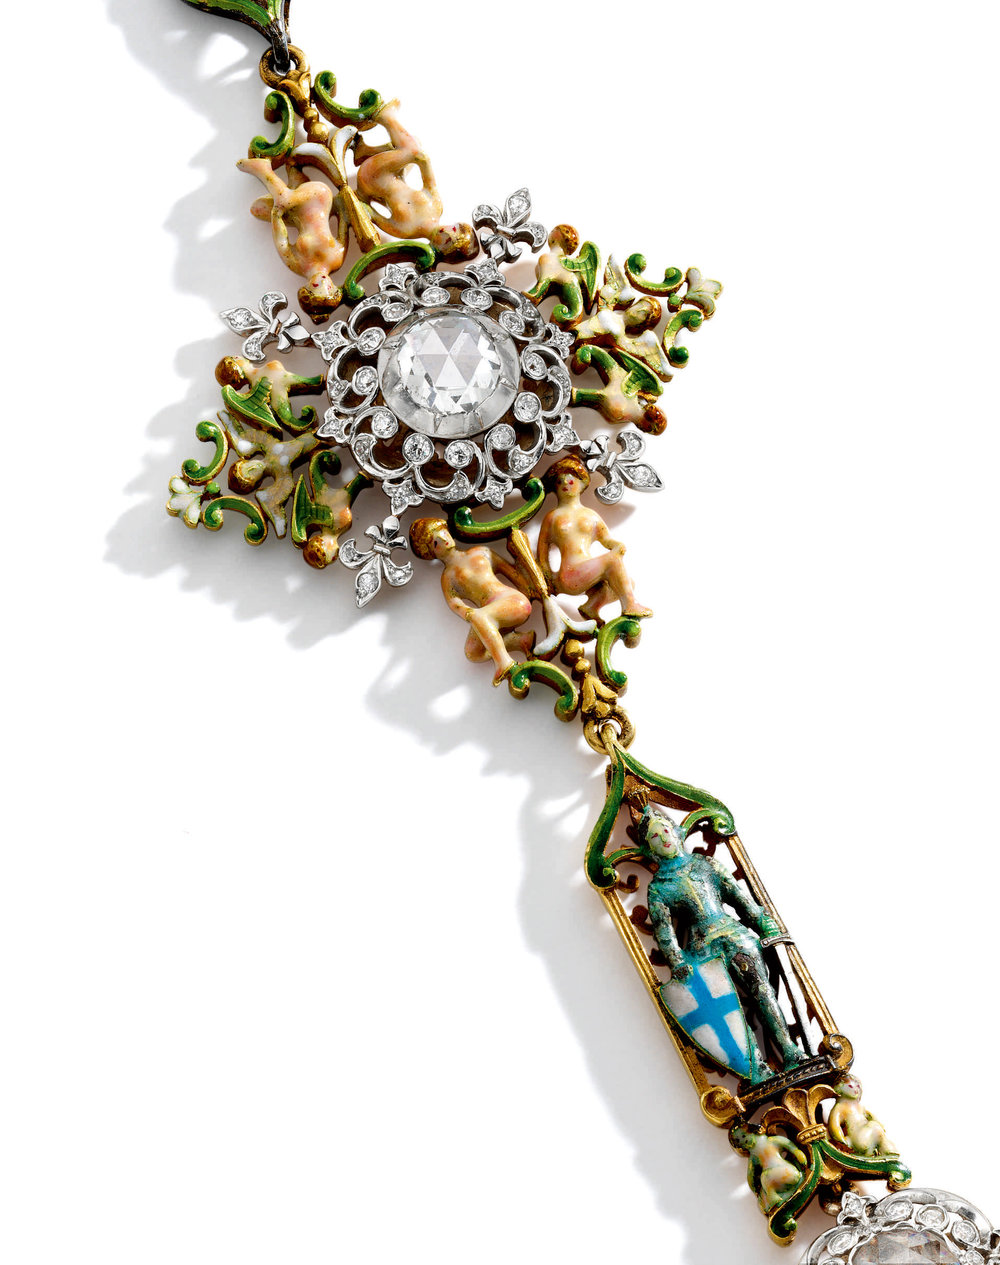 Enamel and Diamond Demi-Parure, Paulding Farnham for Tiffany & Co.